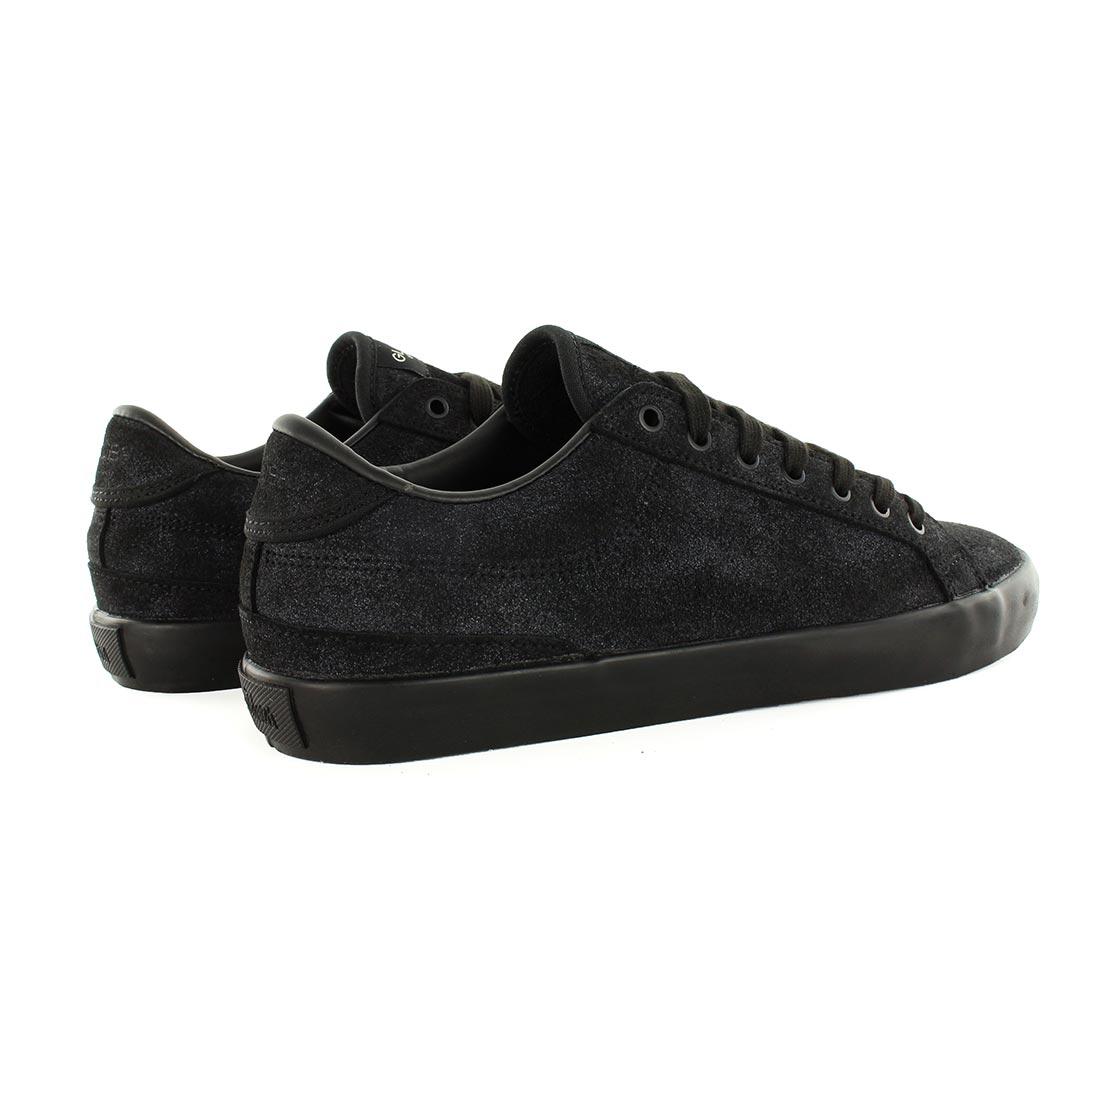 Globe Shoes x Monster Children Status - Black Suede